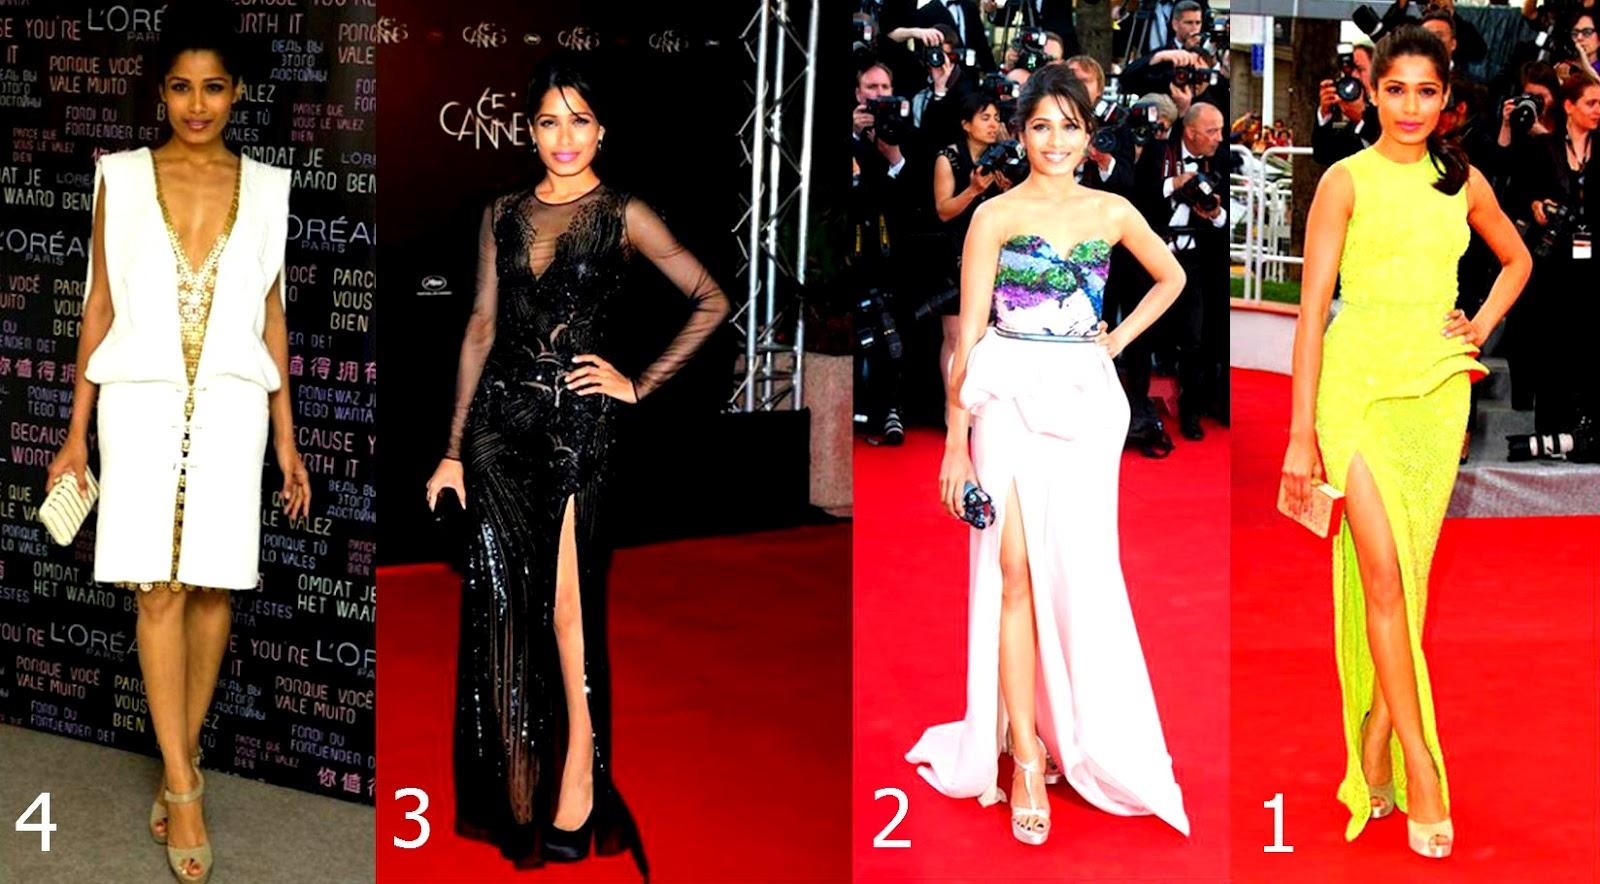 http://4.bp.blogspot.com/-TjDekgFXQwk/T7gk1R6-HmI/AAAAAAAAHxA/XCCx56QSZr4/s1600/Frida-1.jpg.jpg